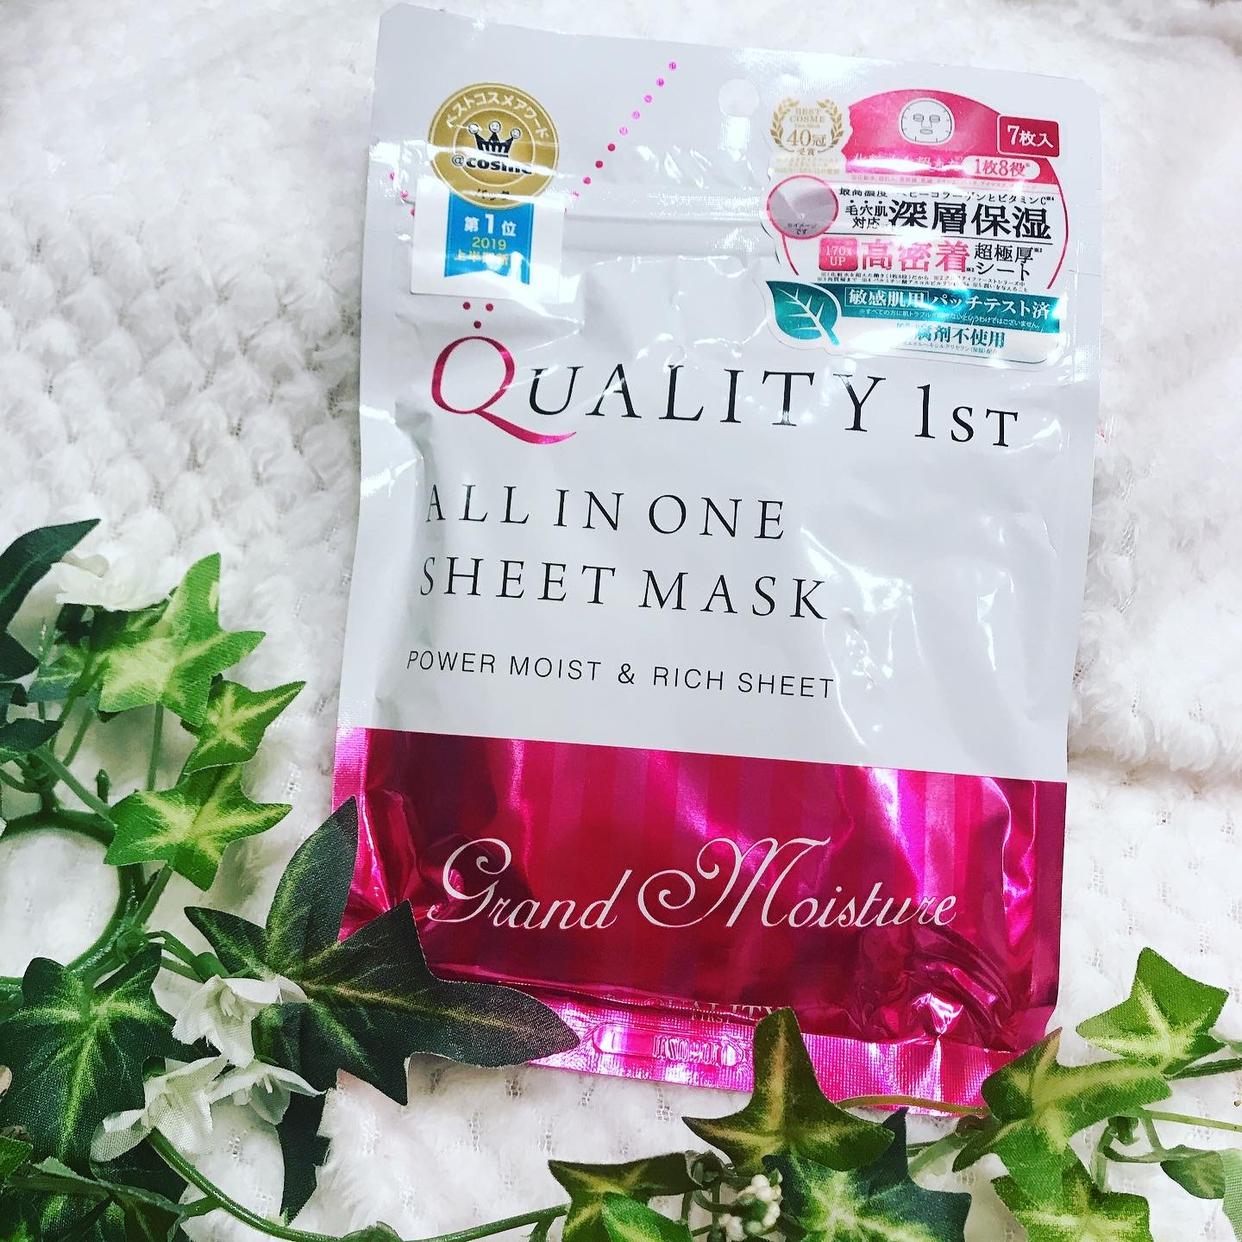 Quality 1st(クオリティファースト) オールインワンシートマスク グランモイストを使ったmisamisa0826さんのクチコミ画像1